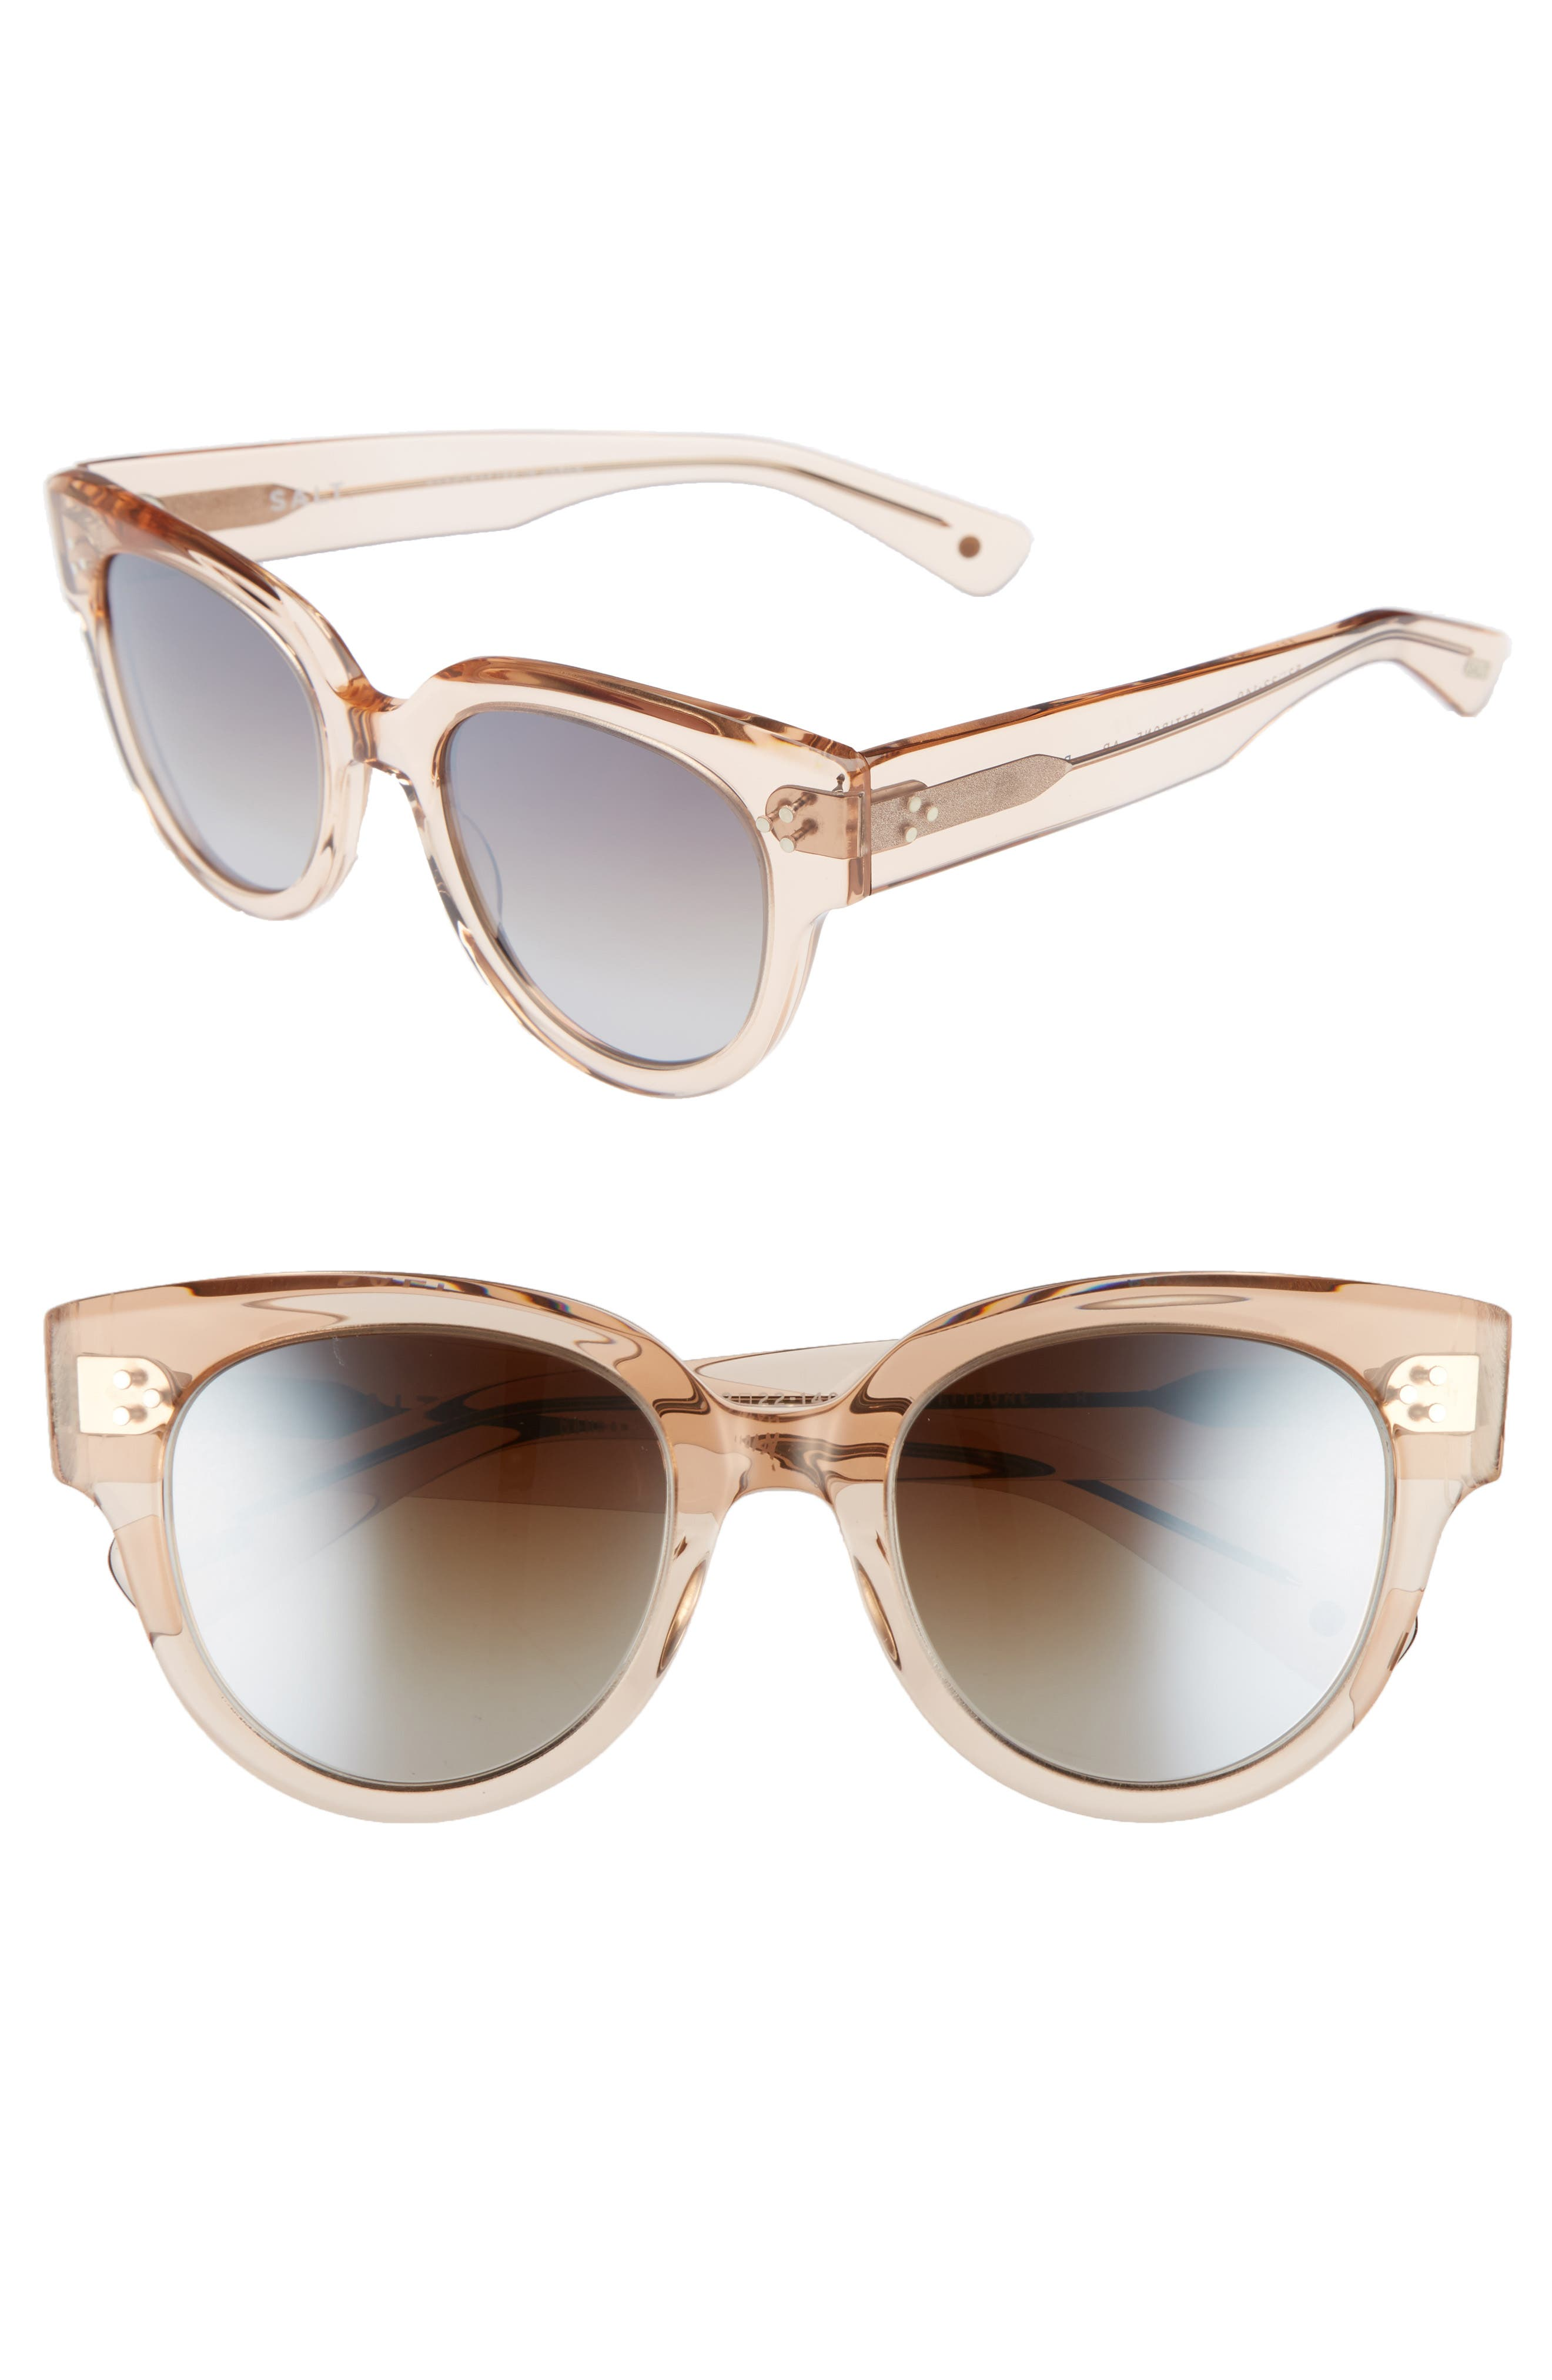 Pettibone 52mm Polarized Sunglasses,                             Main thumbnail 4, color,